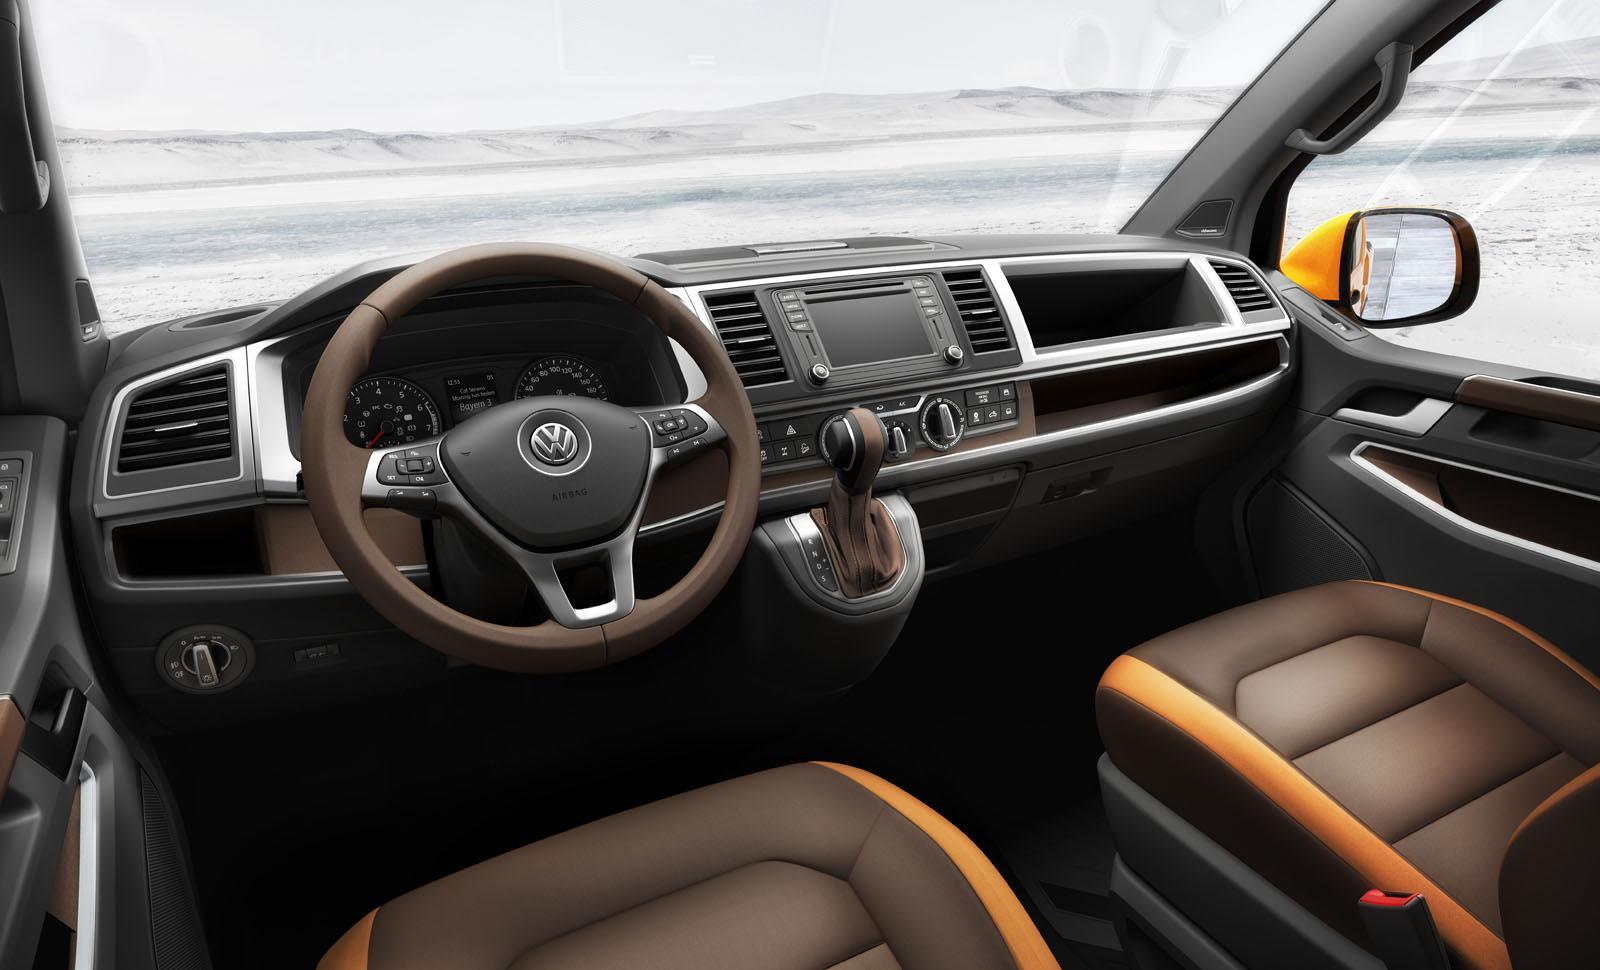 Volkswagen Tristar Concept Revealed in Hanover, Previews T6 Transporter - autoevolution